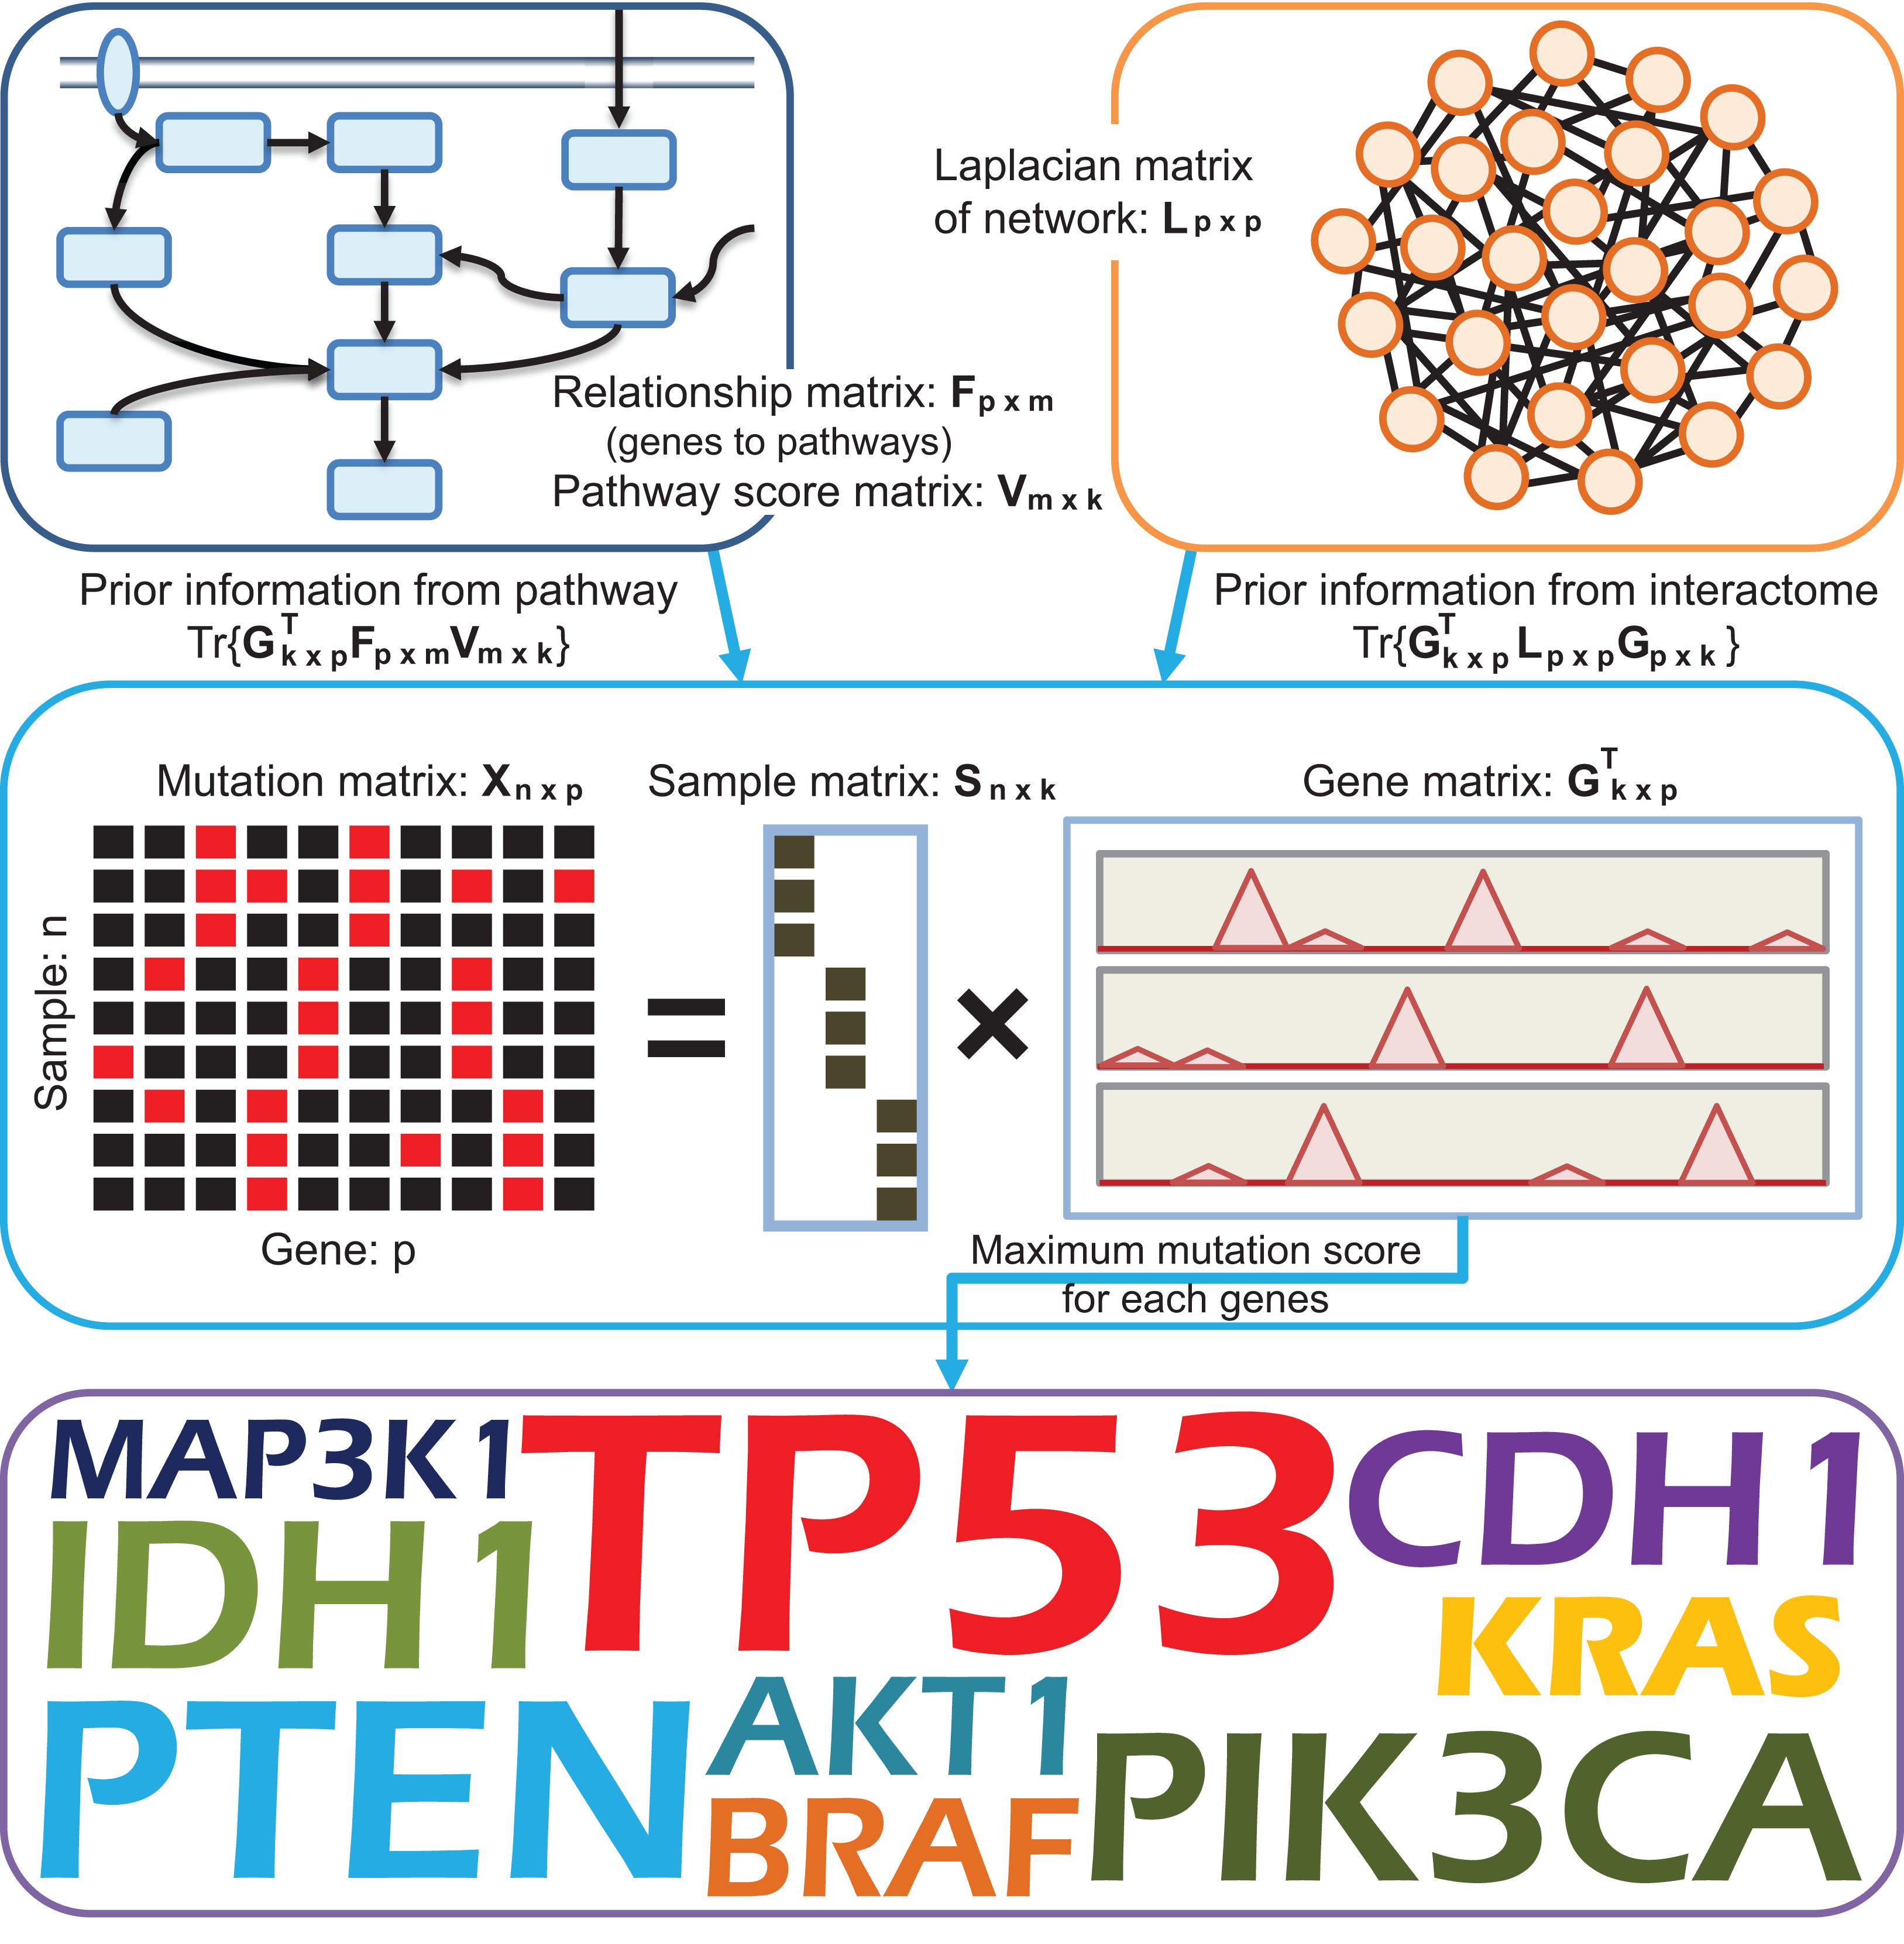 Dgpathinter A Novel Model For Identifying Driver Genes Via Internet Connection Diagram Sarine Light Download Full Size Image